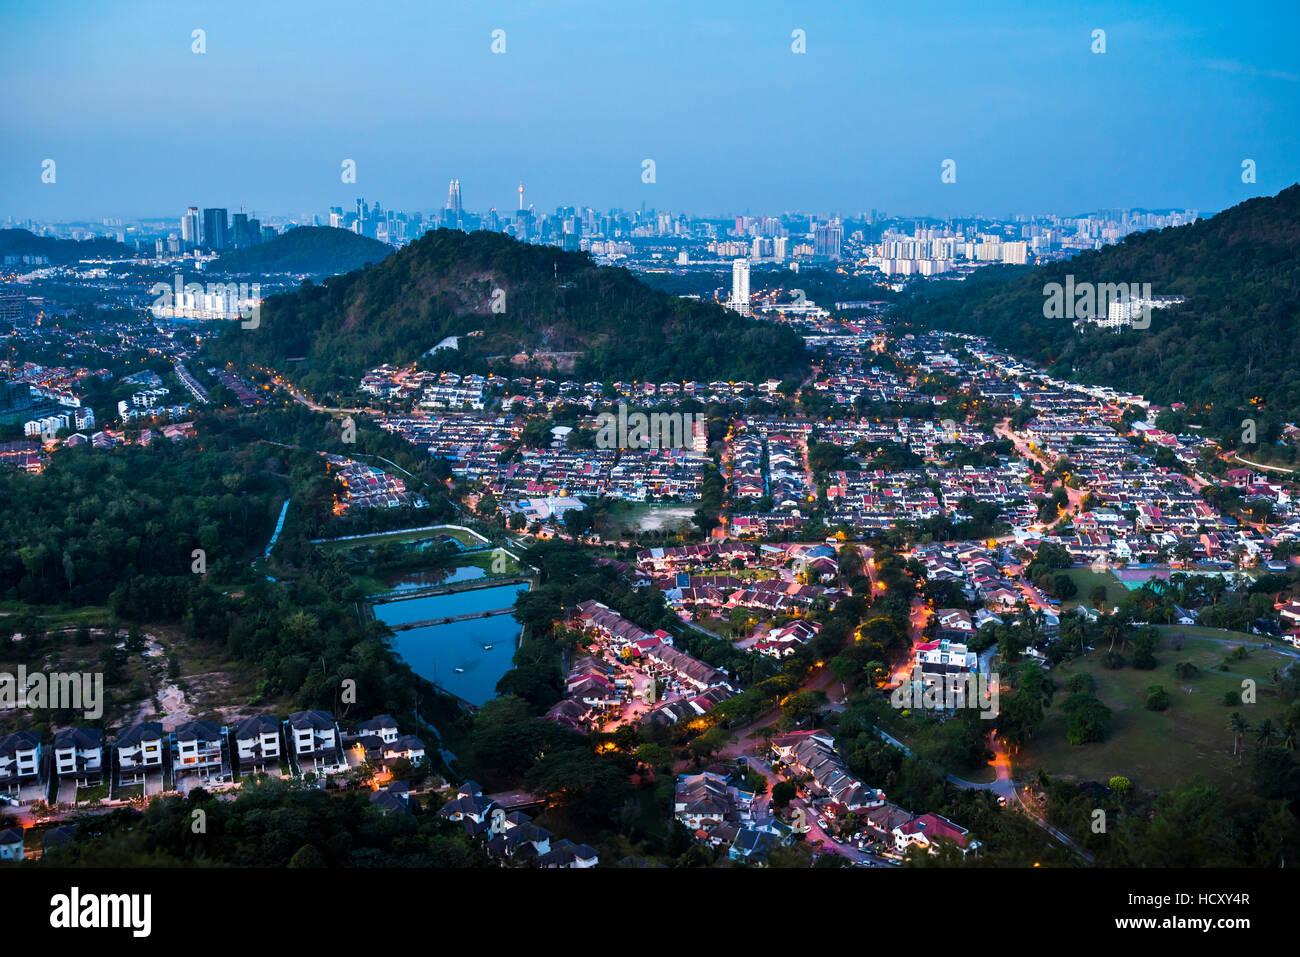 Kuala Lumpur skyline at night seen from Bukit Tabur Mountain, Malaysia - Stock Image